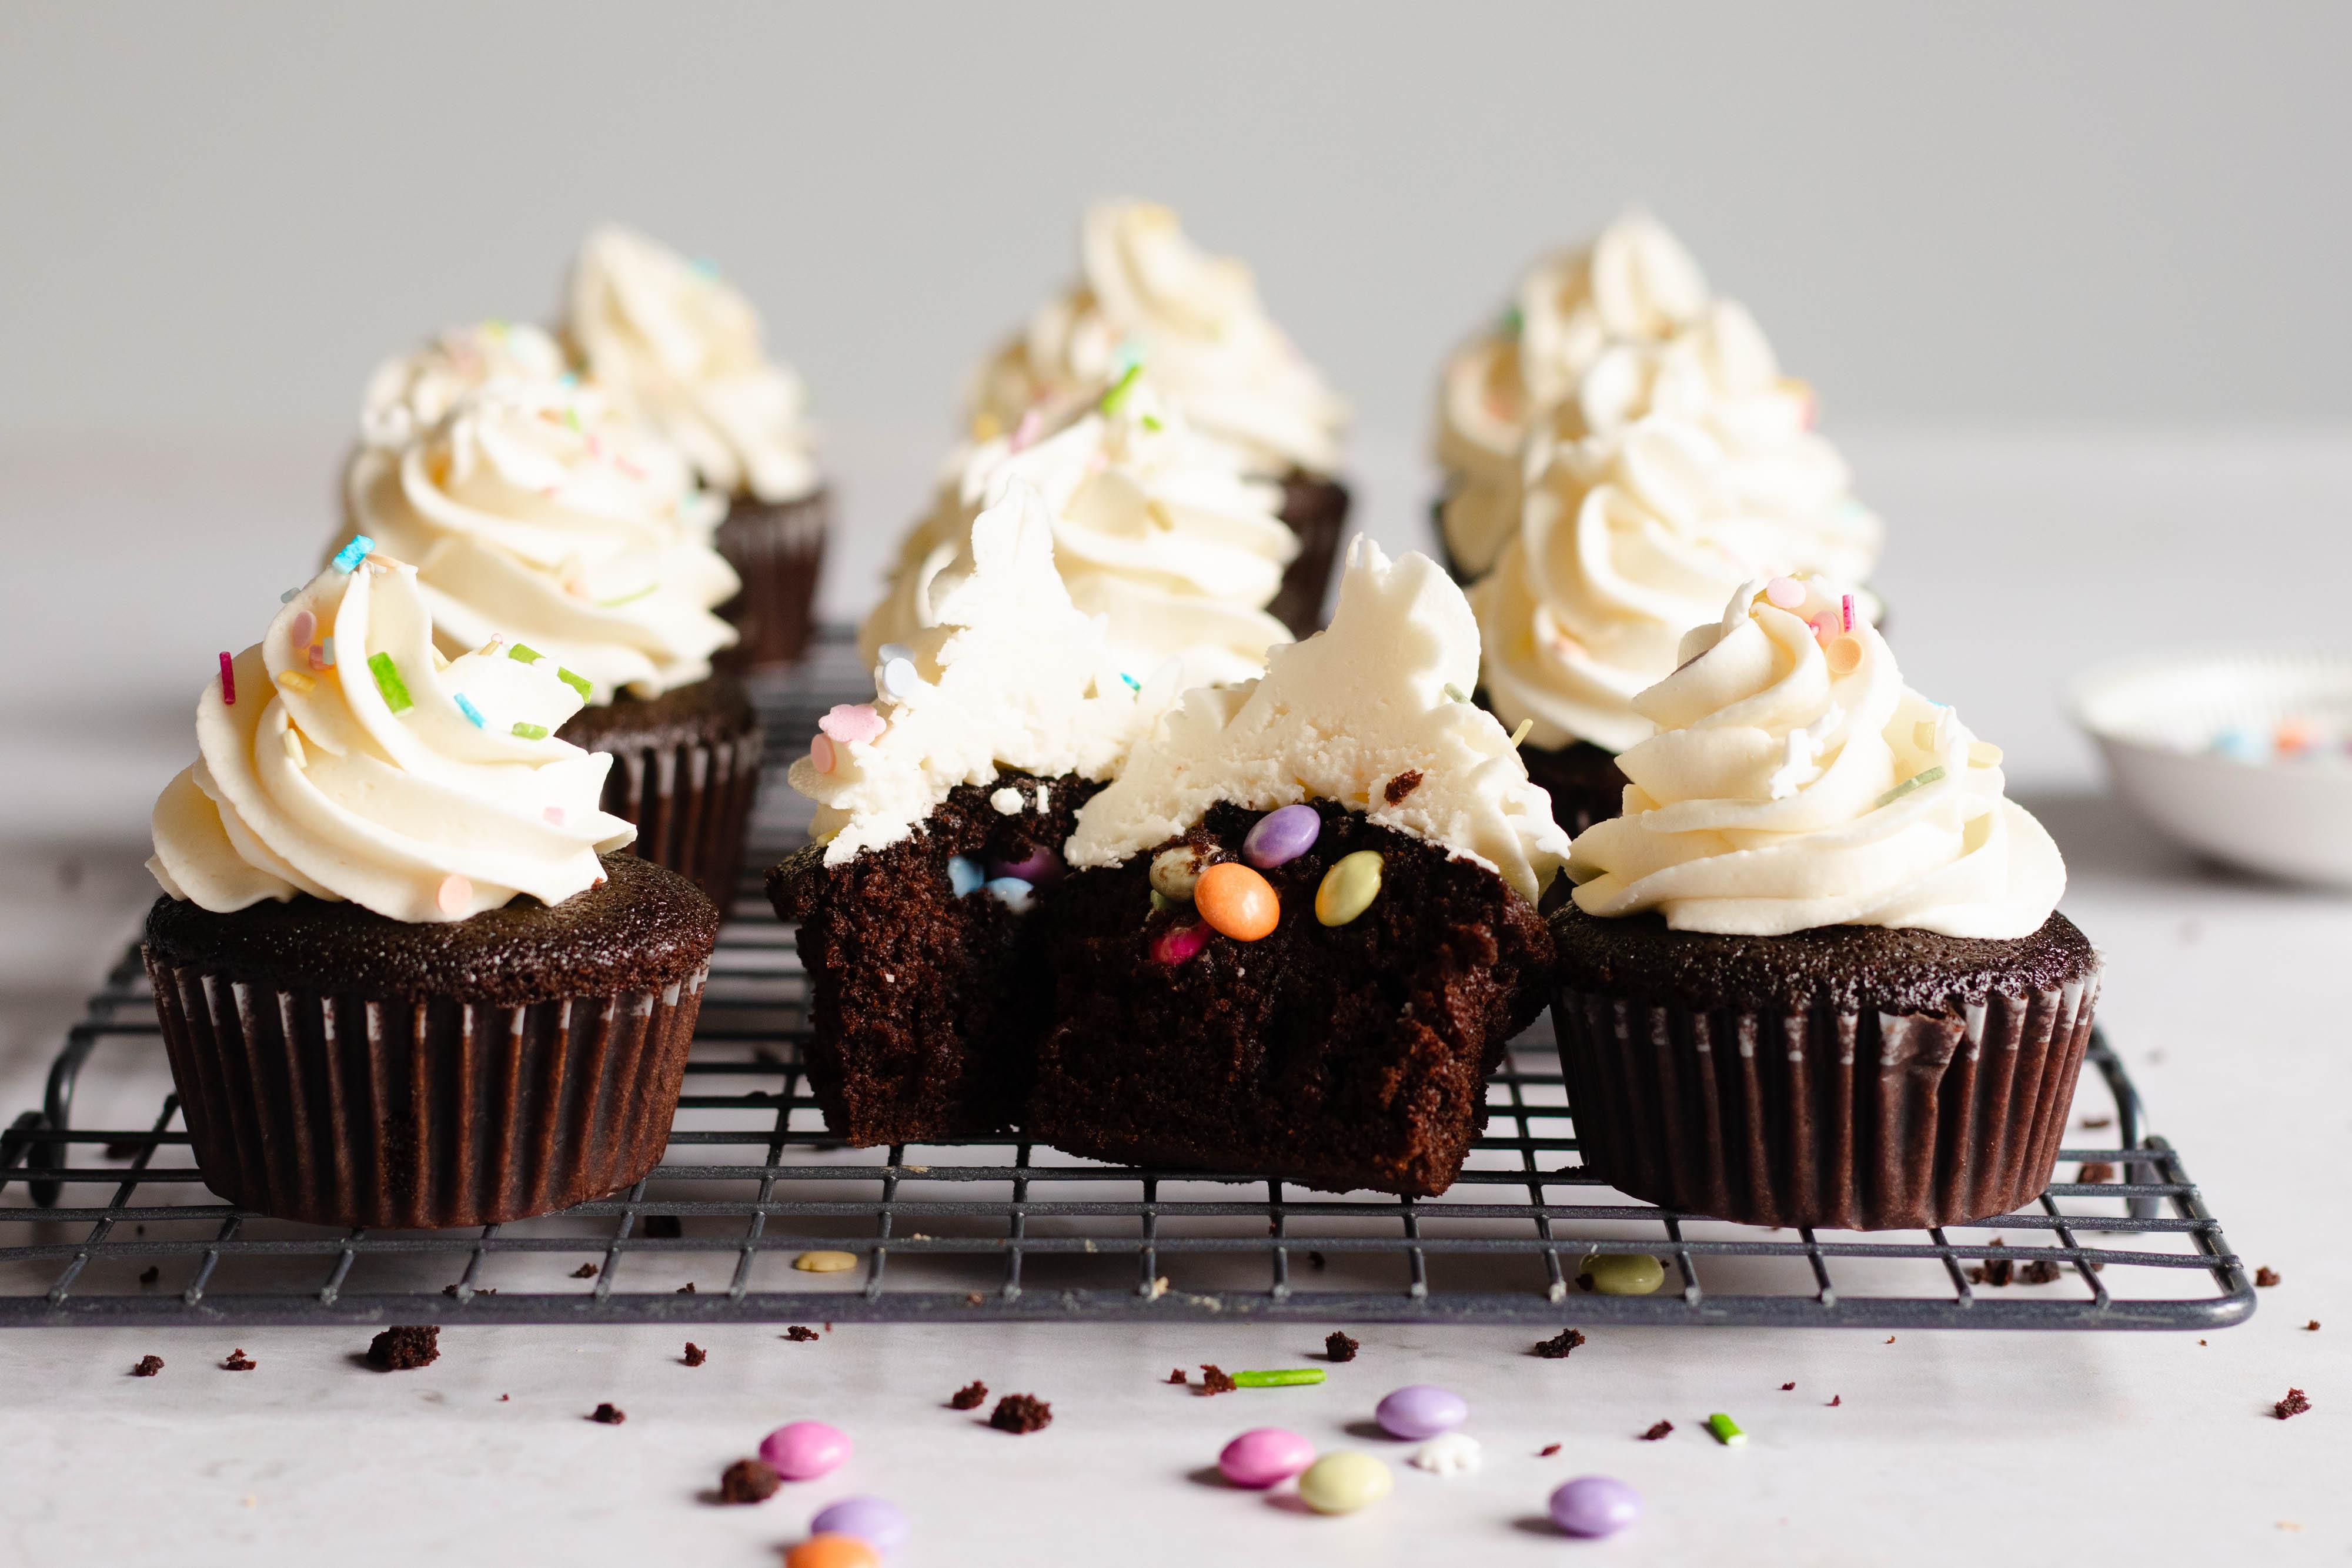 Suprise Chocolade Cupcakes met Smarties